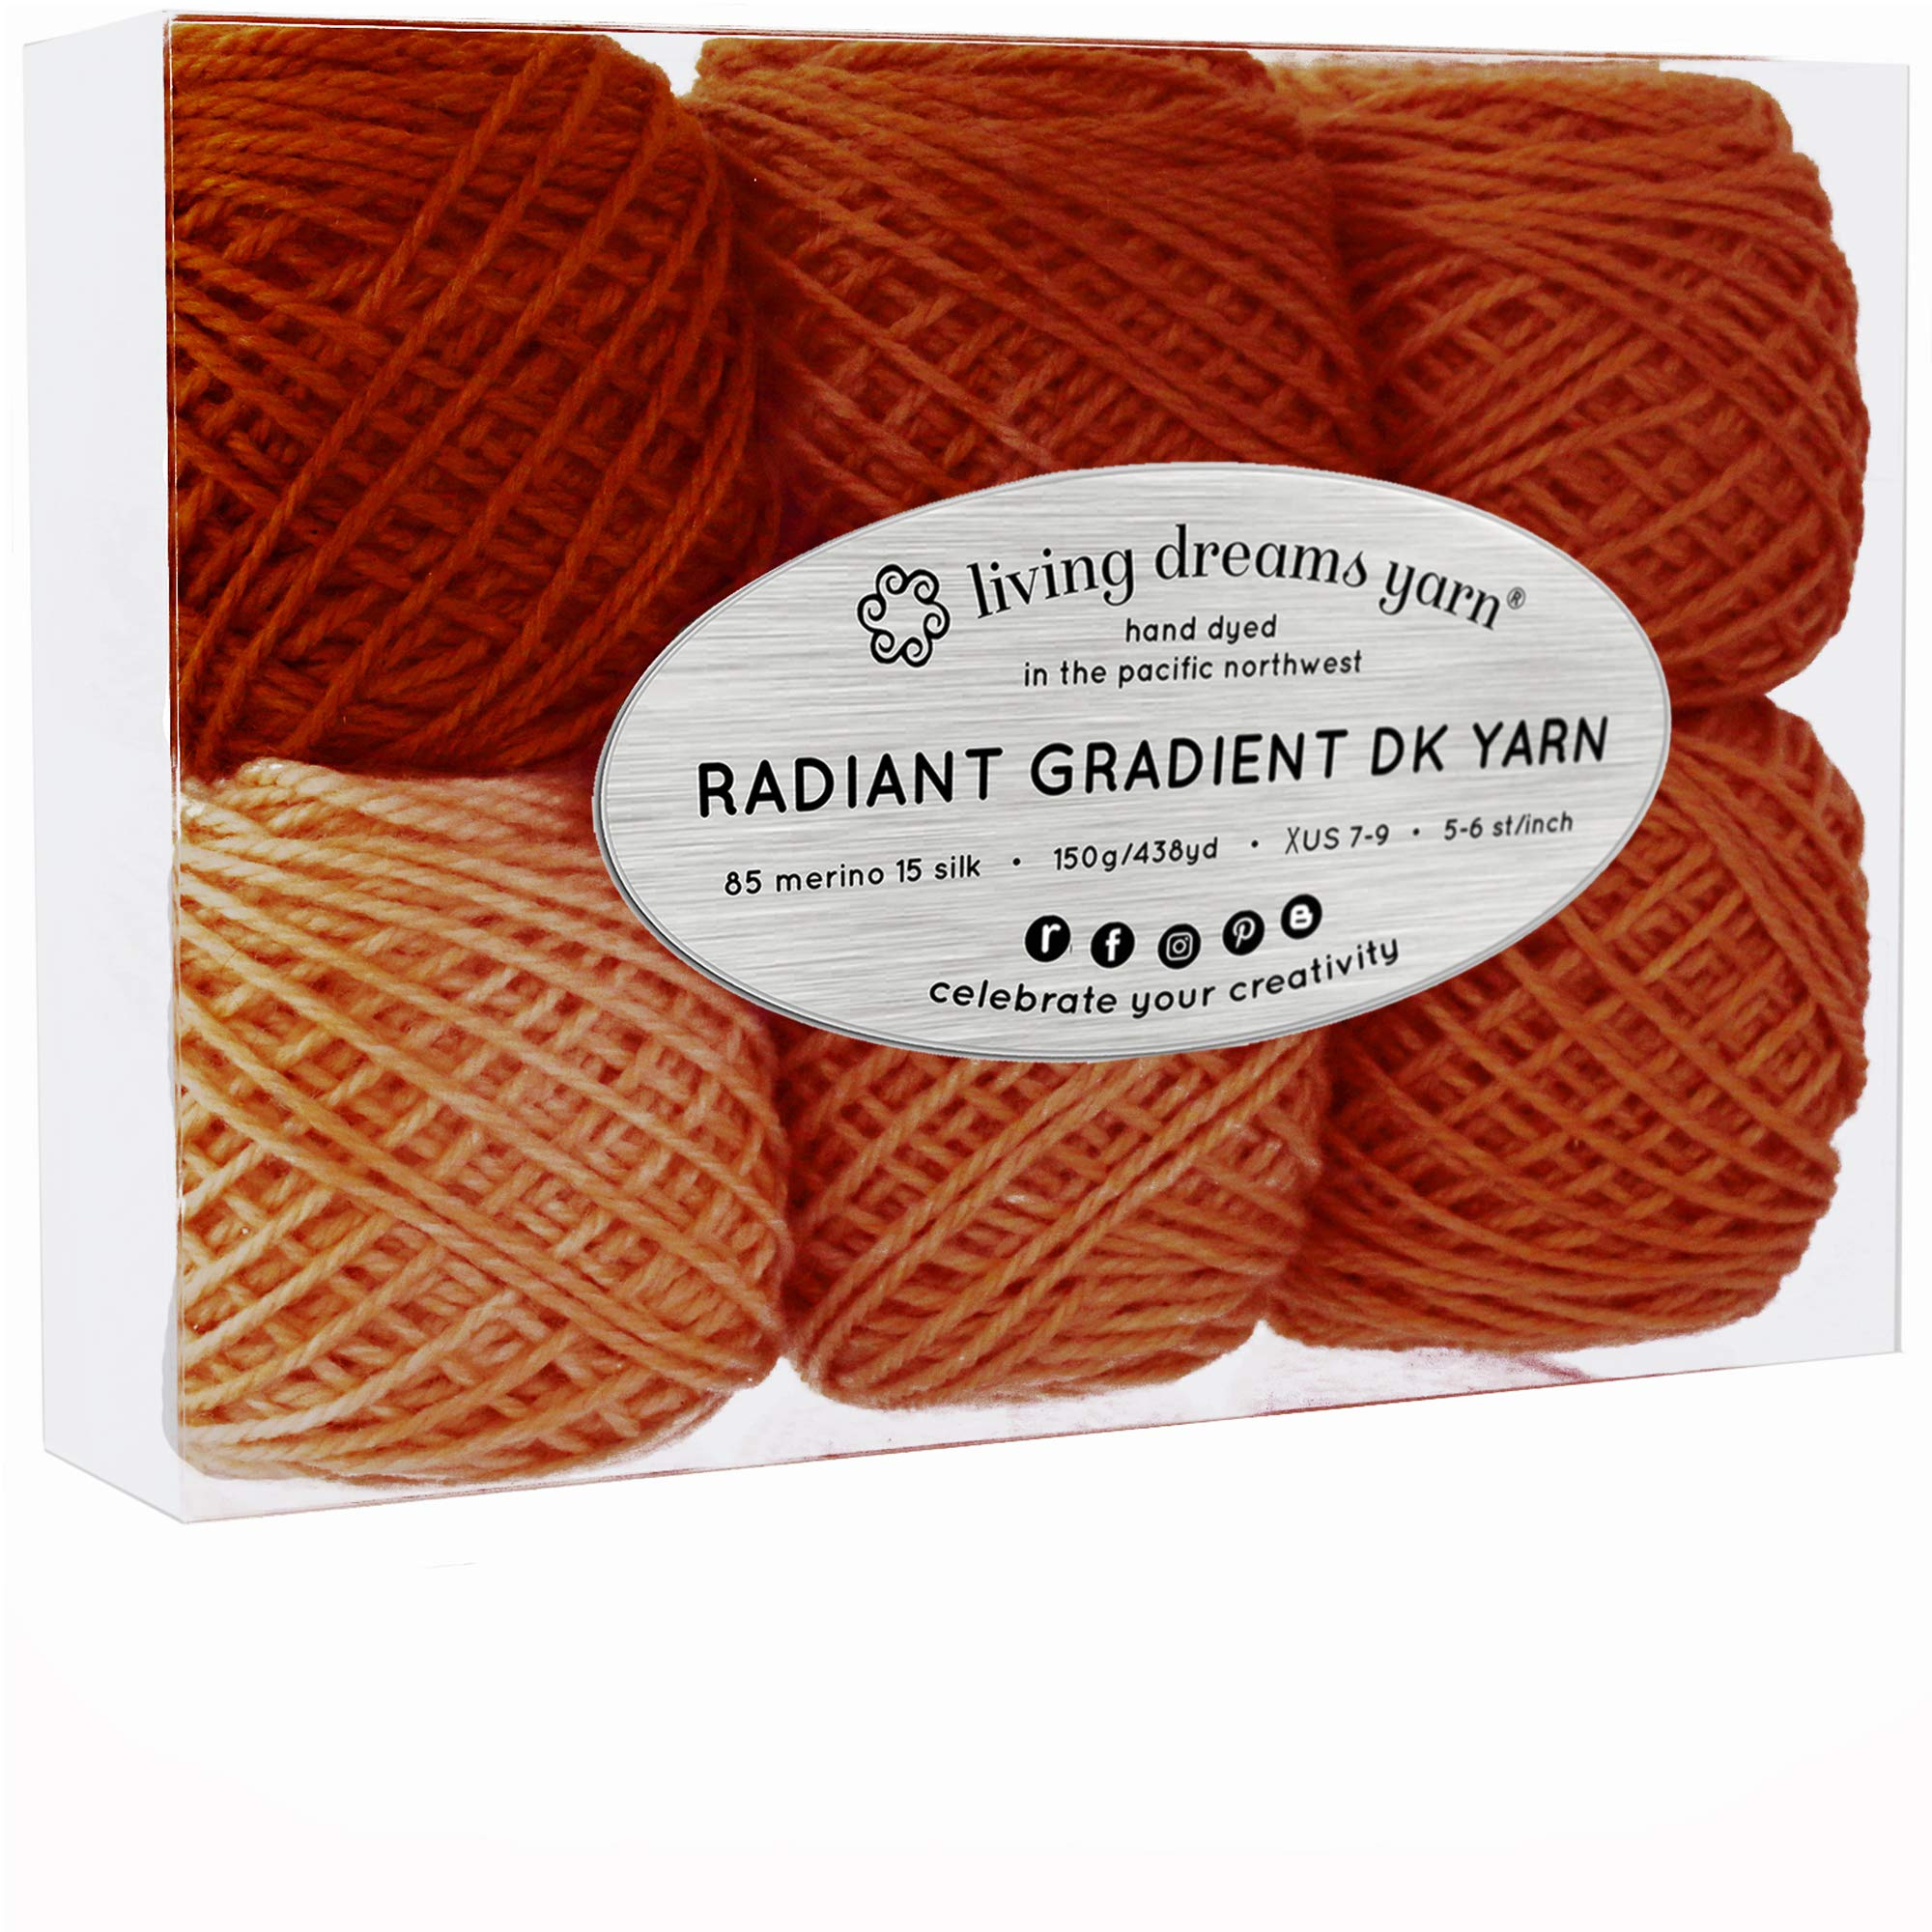 Living Dreams Radiant Gradient DK Yarn. Super Soft Merino Silk. USA Hand Dyed: Saffron Spice